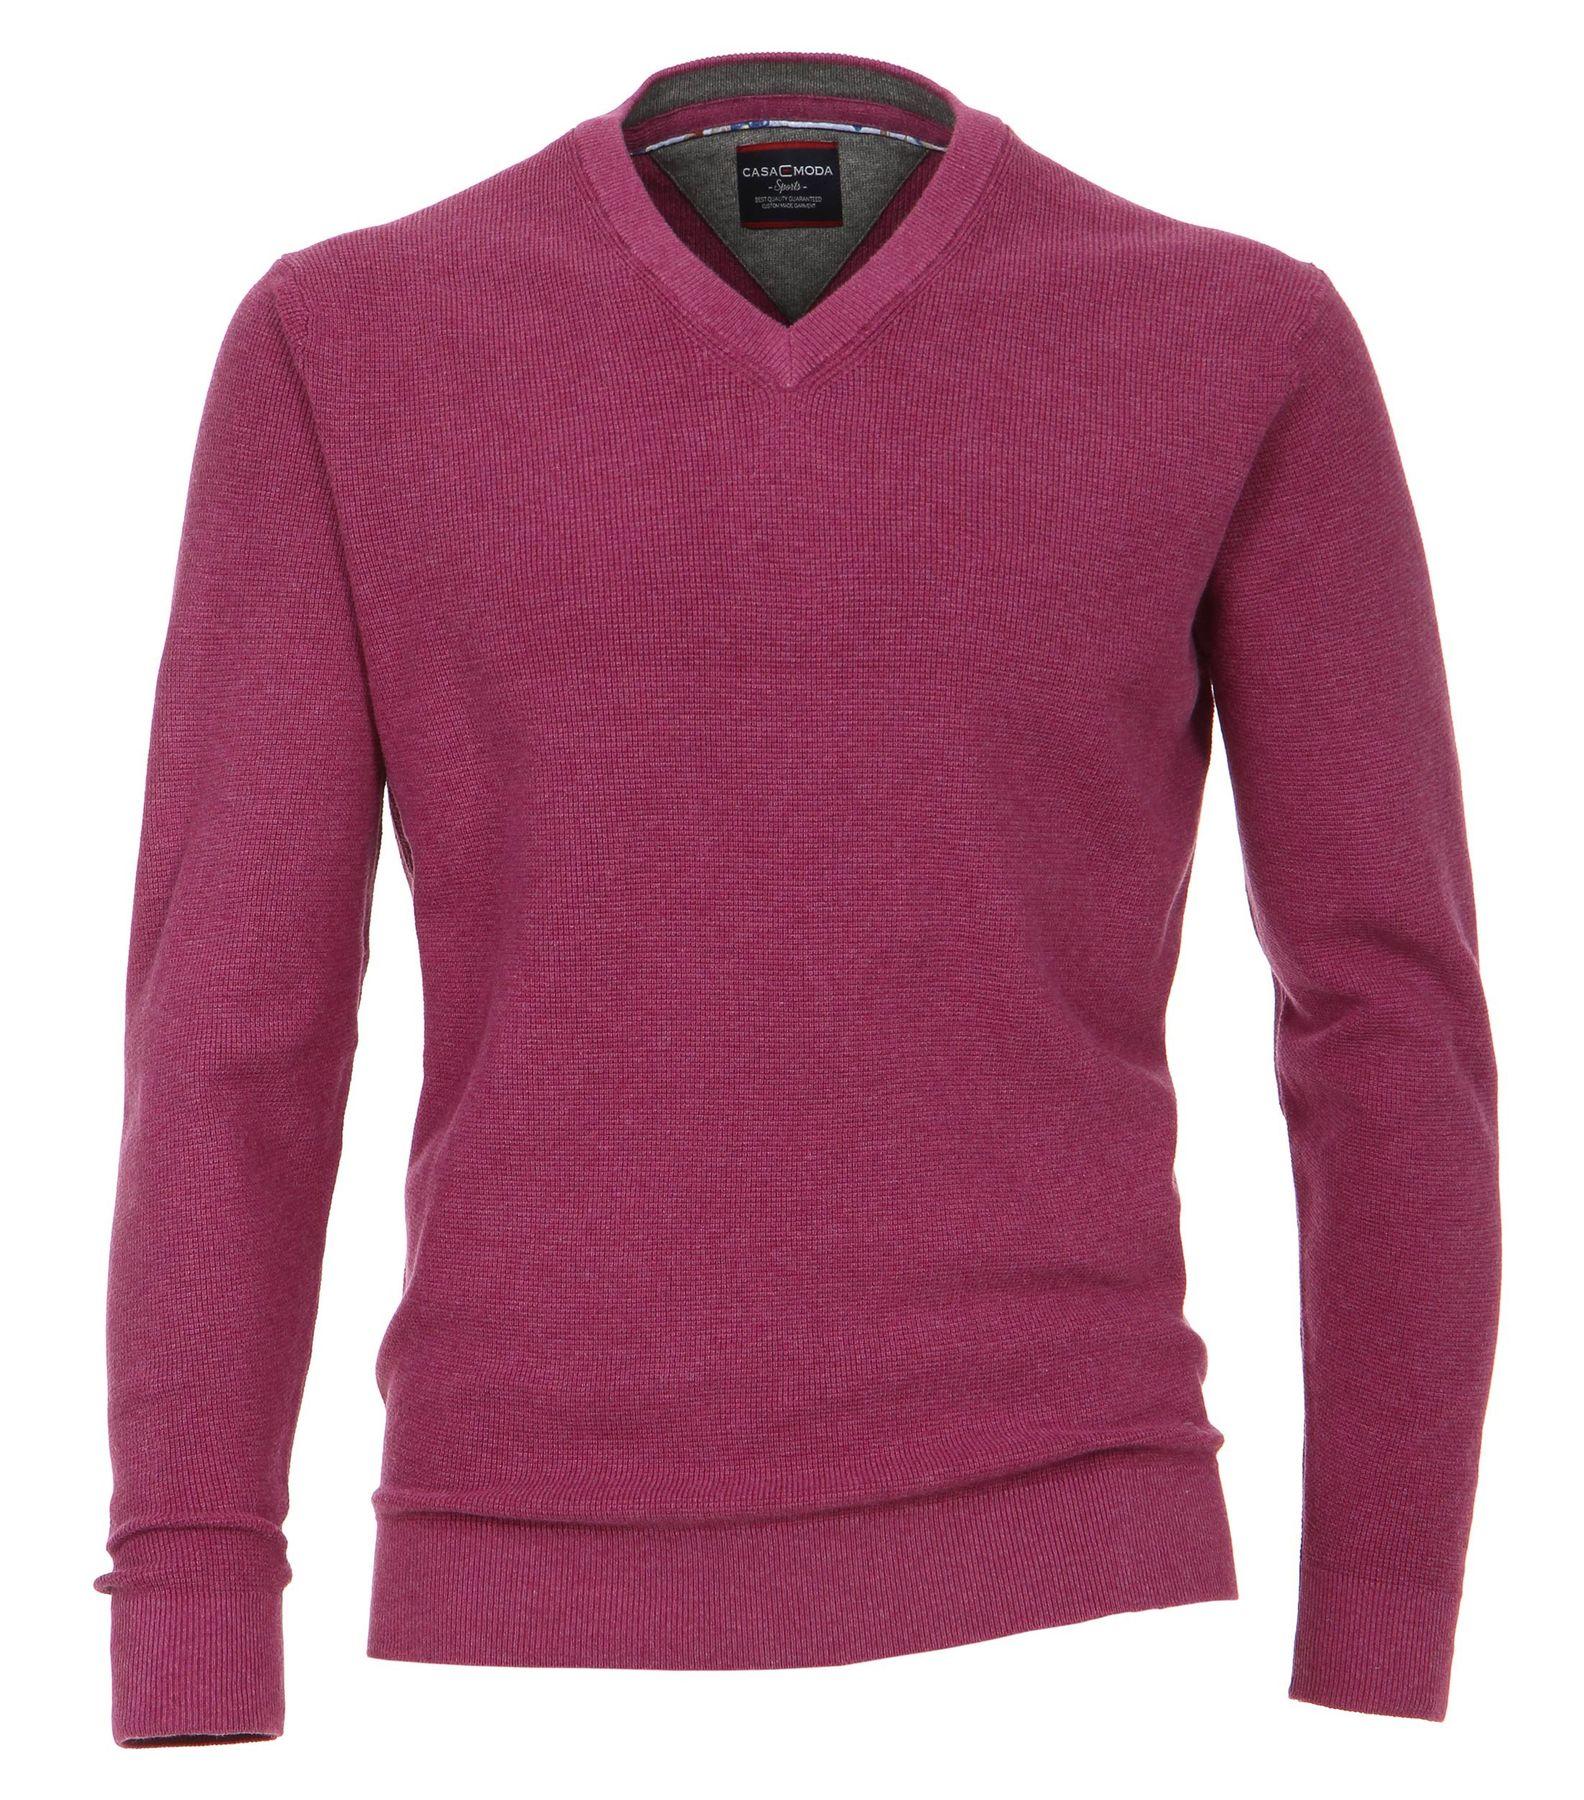 Casa Moda - Unifarbener Herren Pullover mit V-Ausschnitt  (472625000A) – Bild 16